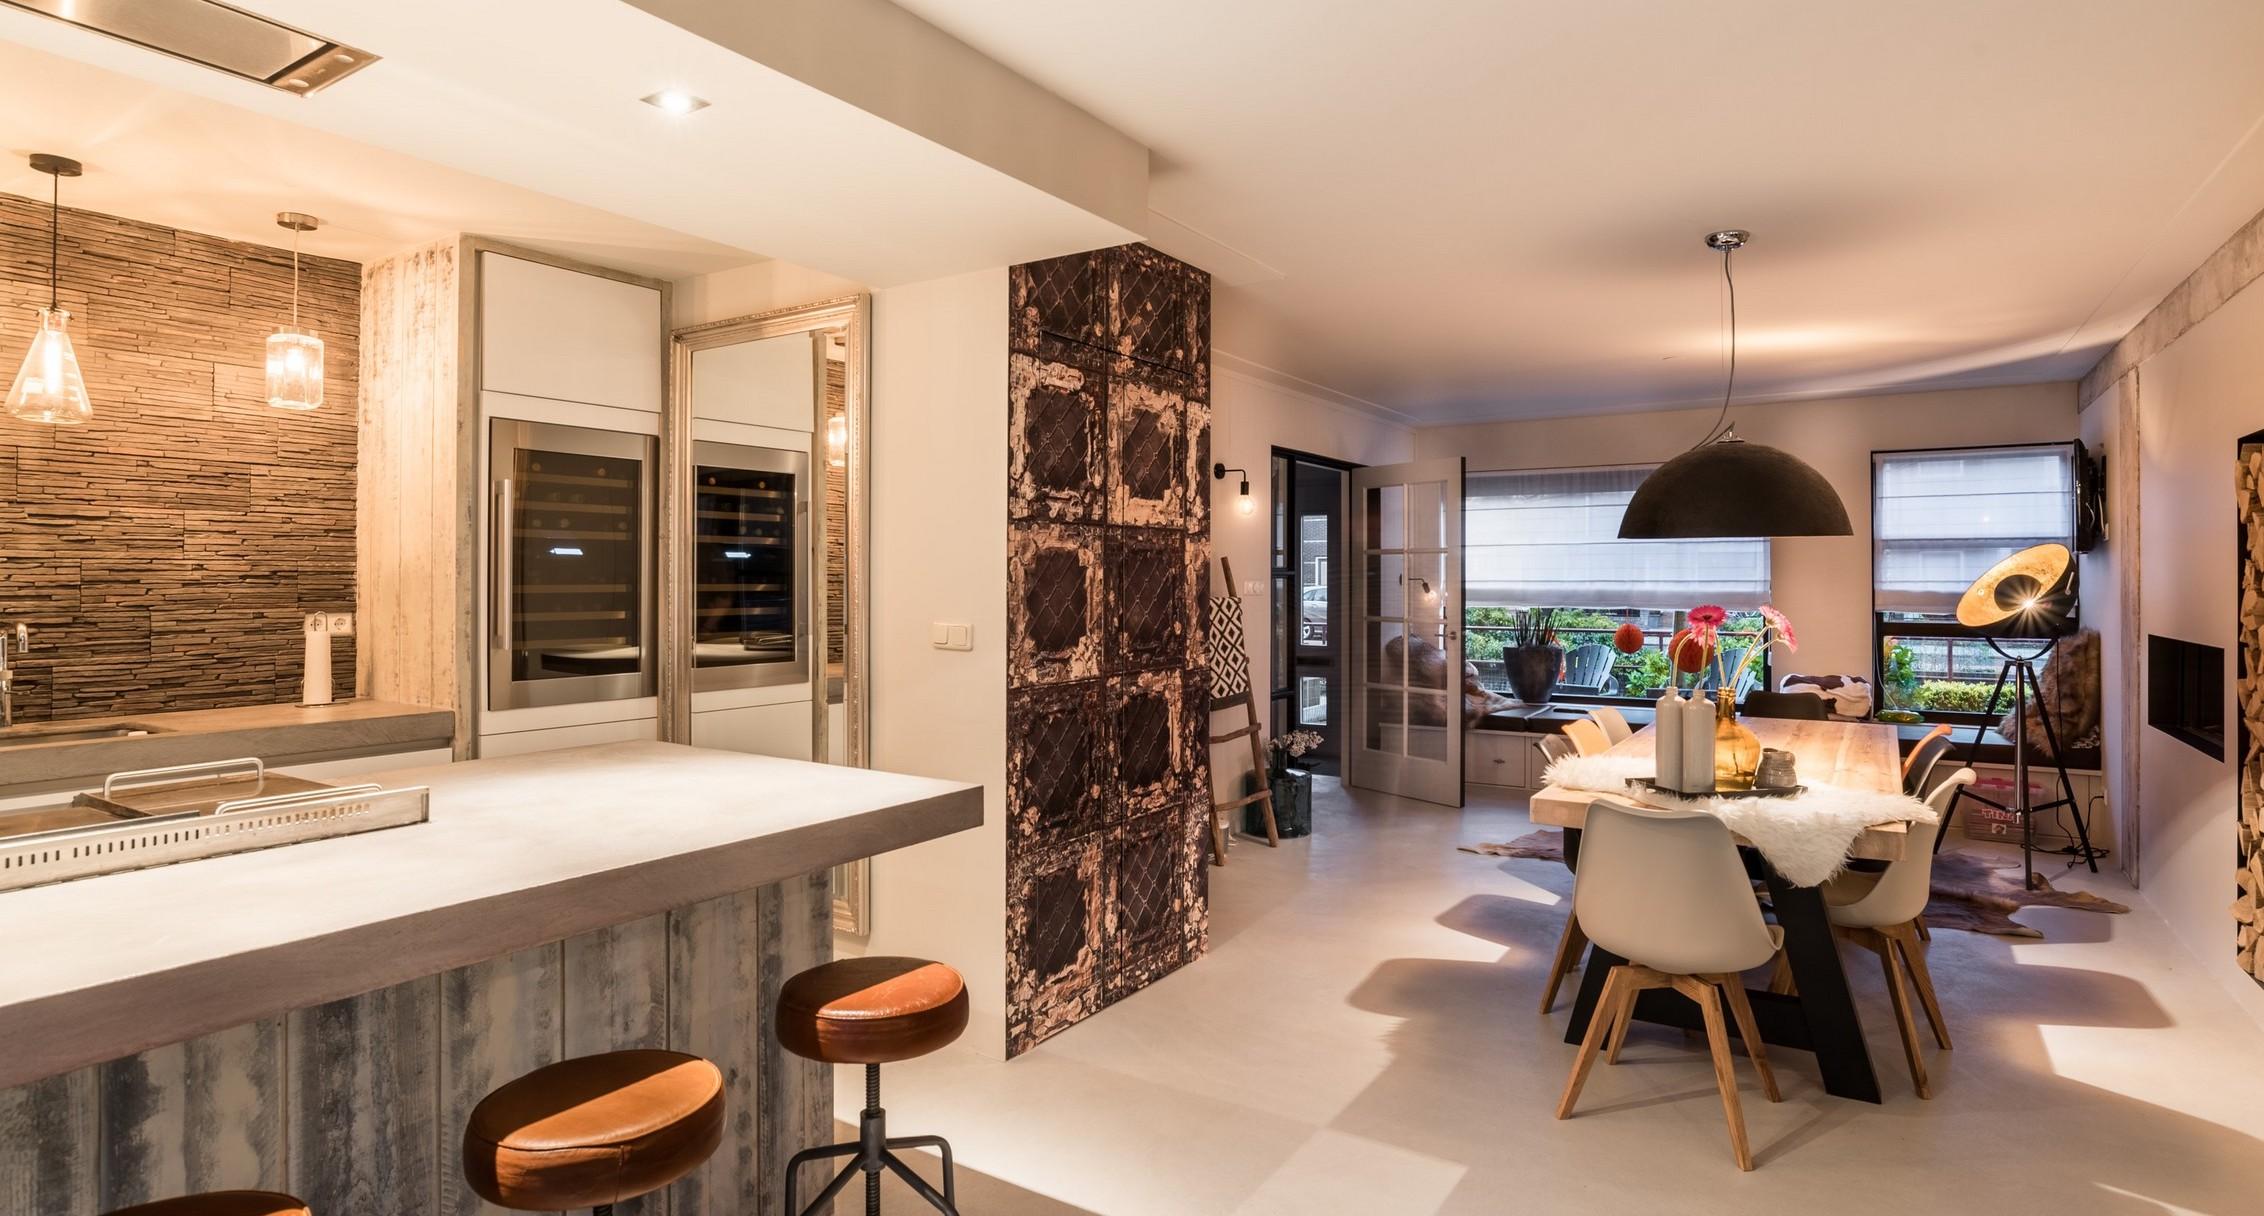 Acquastone_cement_design_wall_Cocina Holanda  (2).jpg